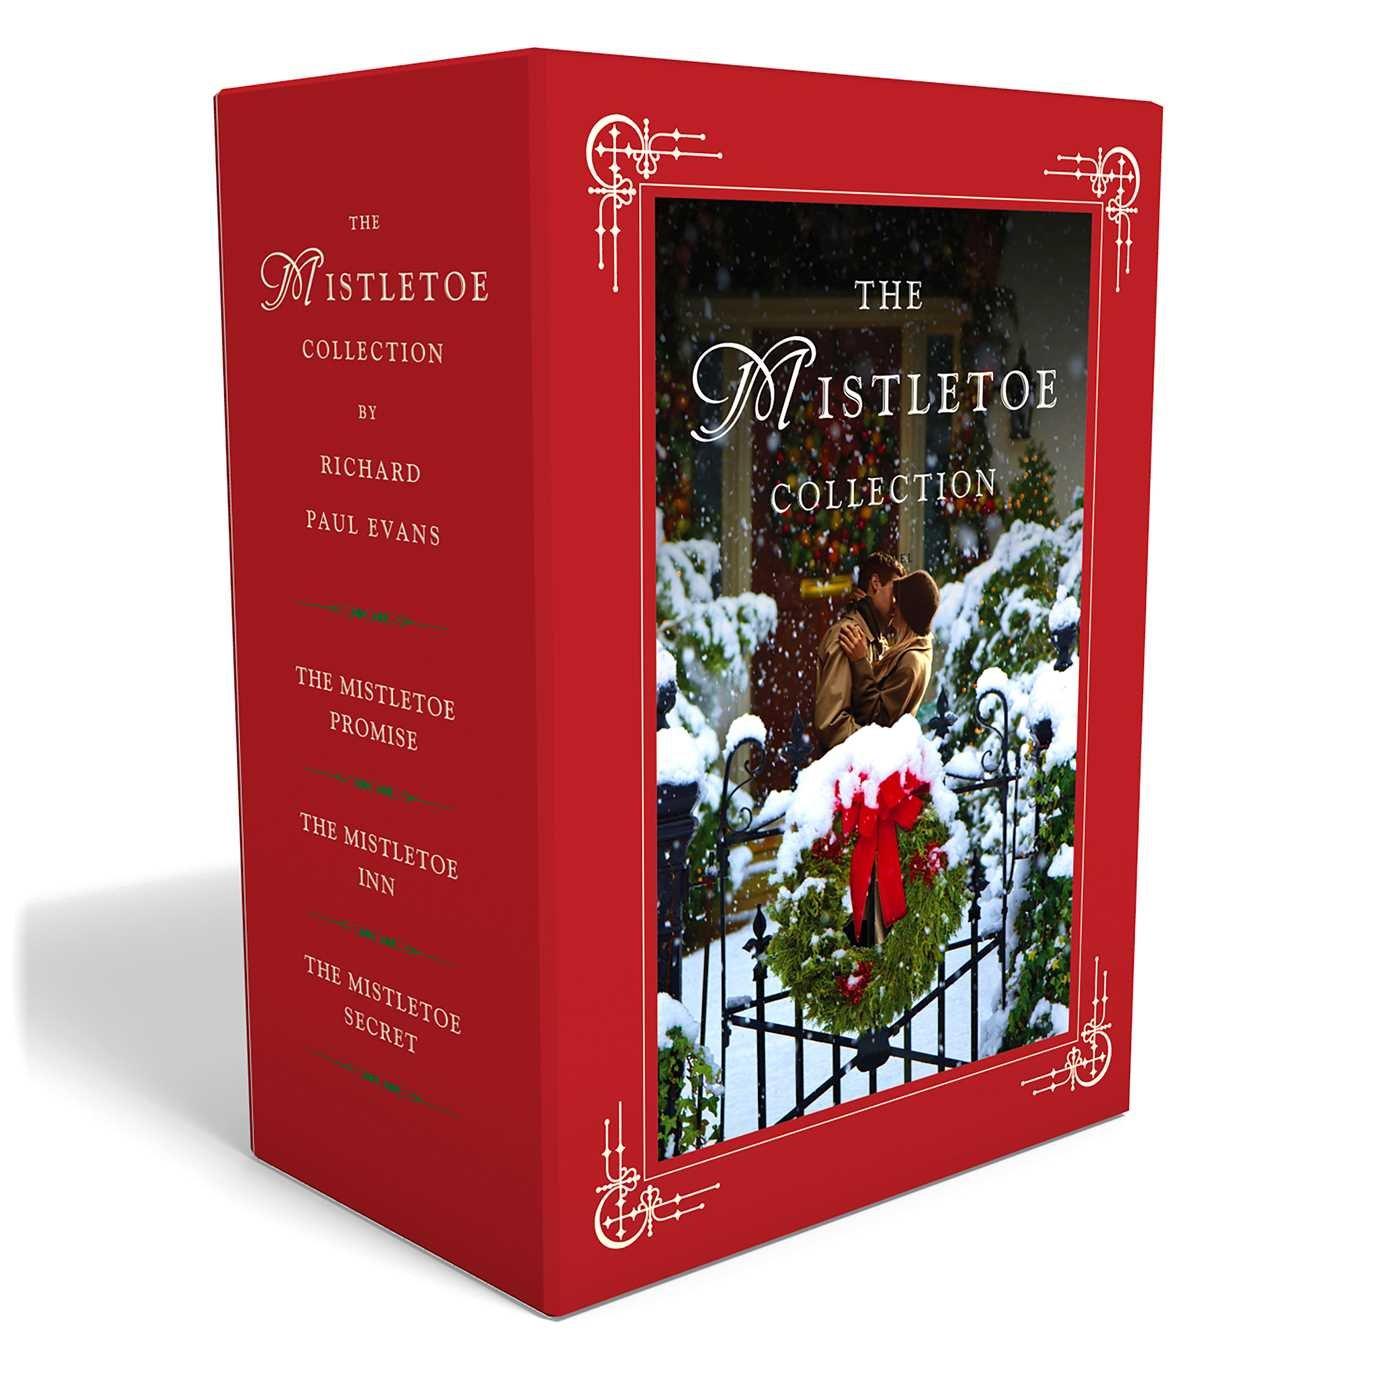 The Mistletoe Christmas Novel Box Set: The Mistletoe Promise, The Mistletoe Inn, and The Mistletoe Secret (The Mistletoe Collection) by Simon & Schuster